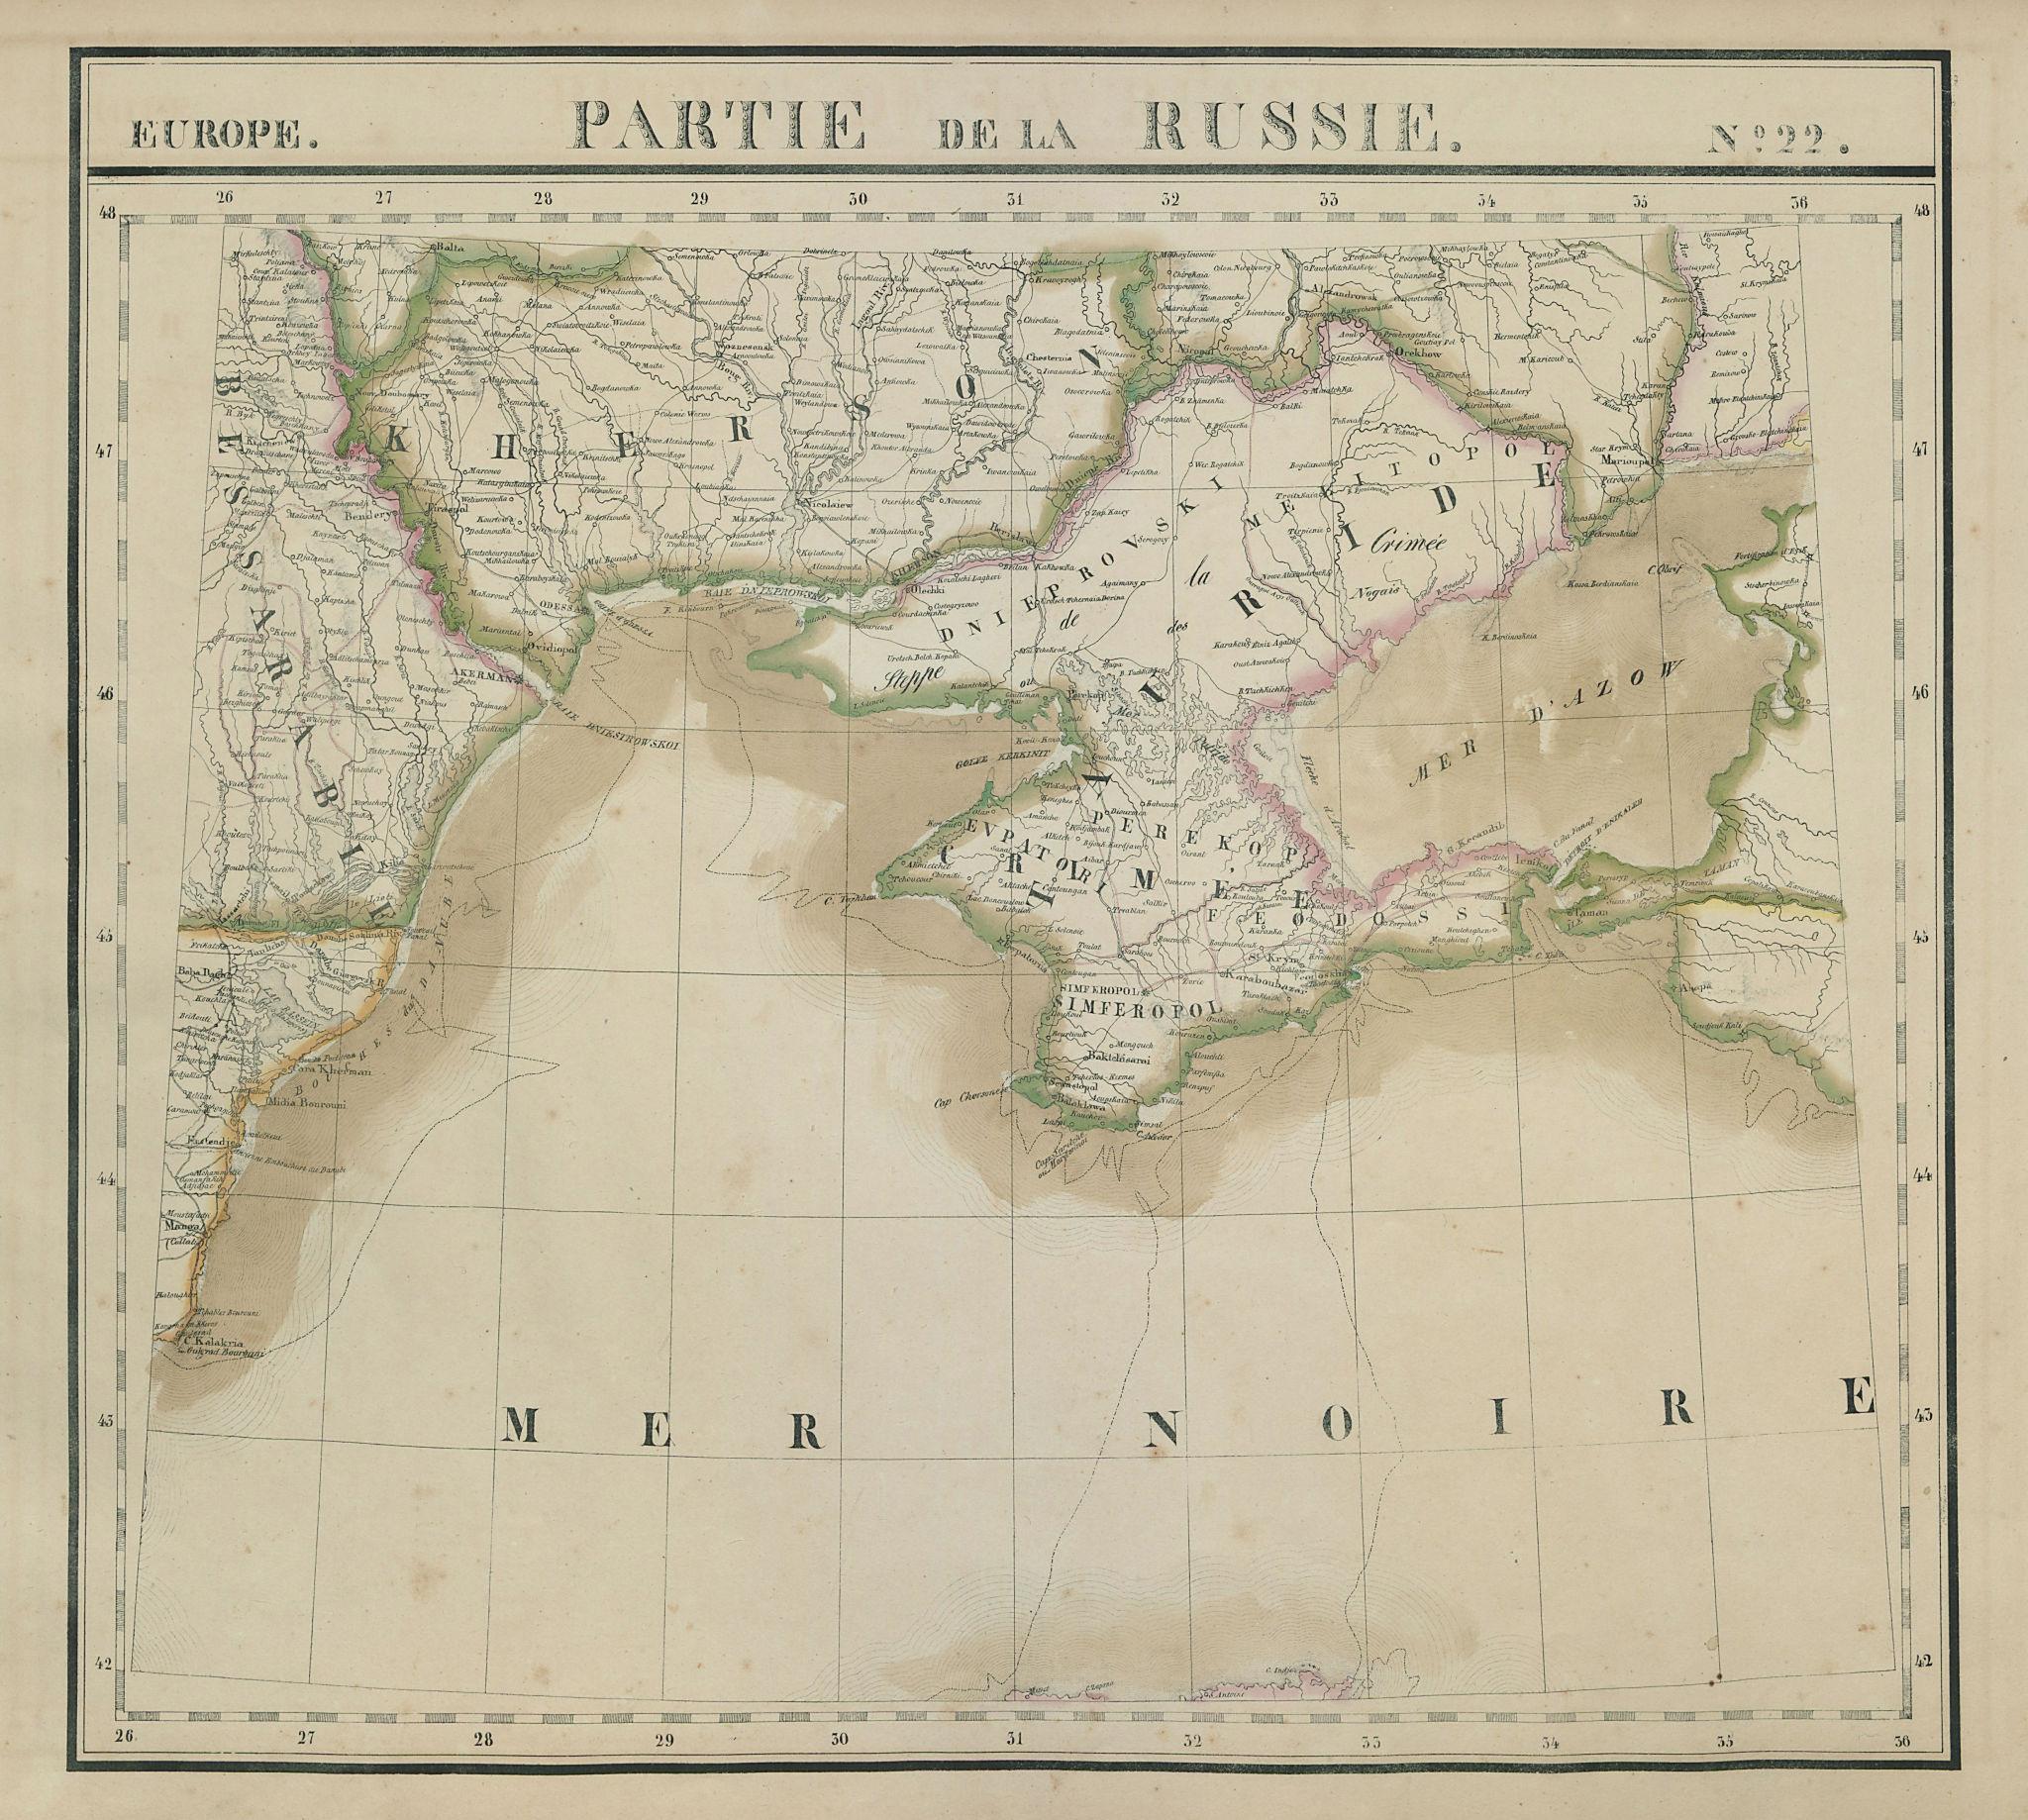 Europe. Russie #22 Southern Ukraine Crimea Krasnodar. VANDERMAELEN 1827 map